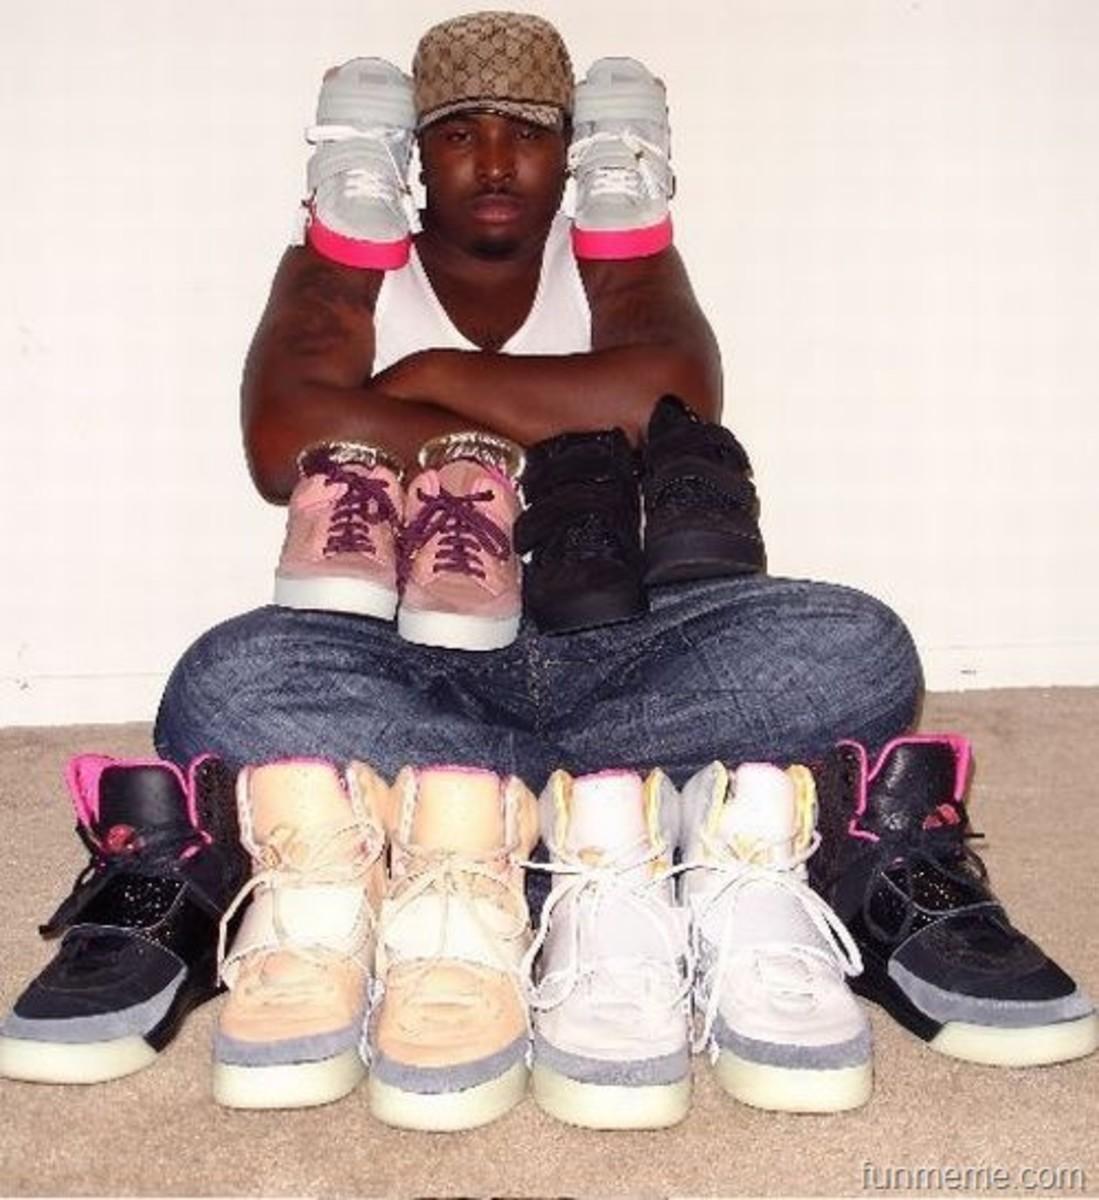 every thug needs kicks, even a pair of pink nikes